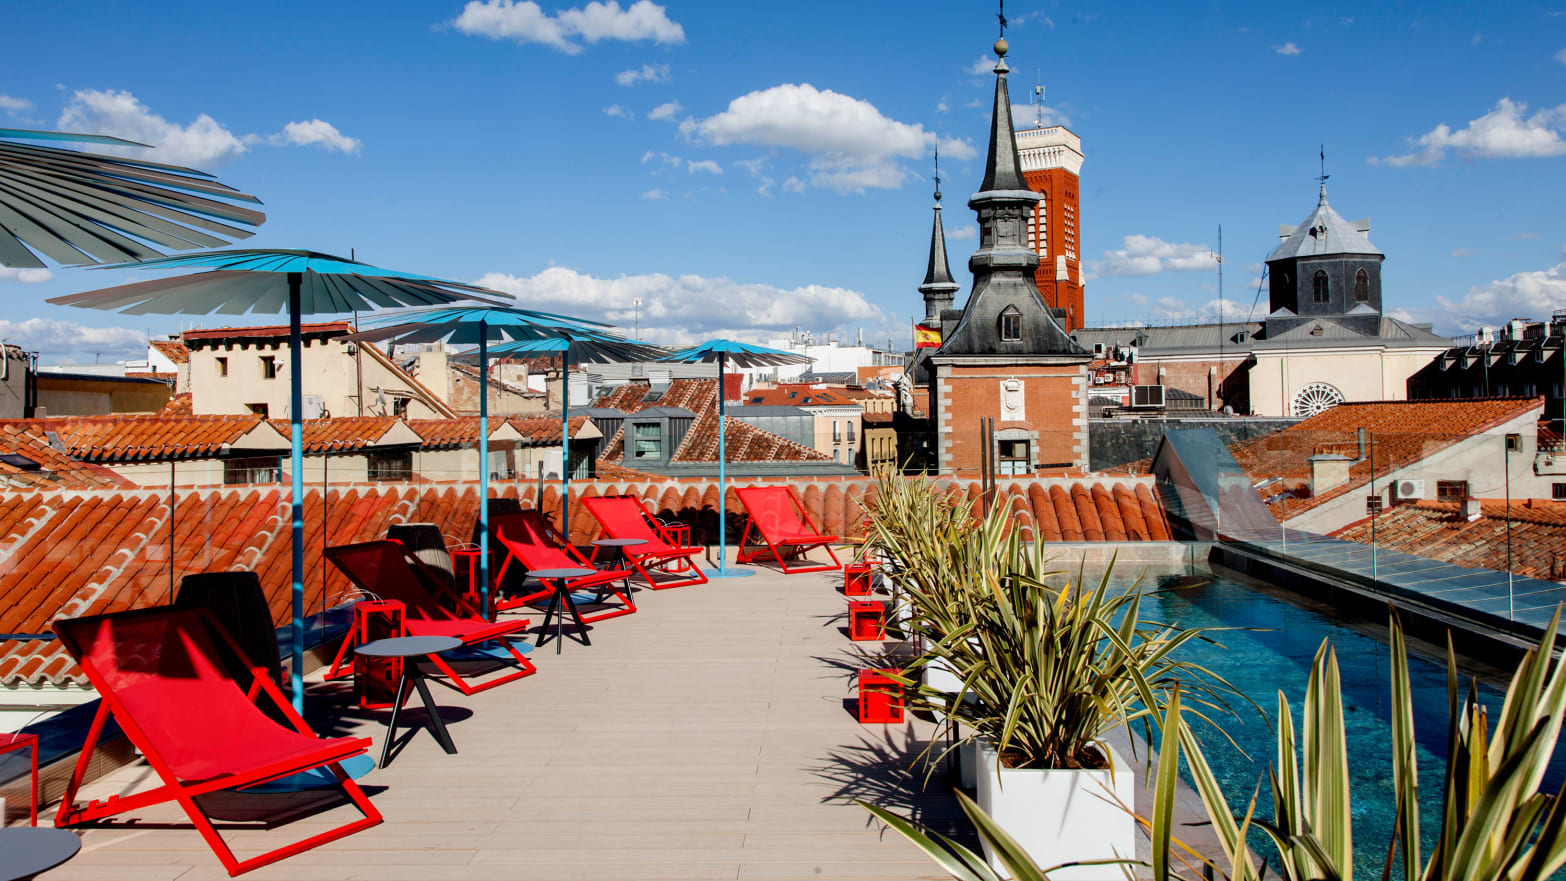 Pestana Plaza Mayor: Madrid's Plaza Mayor Got Its First Hotel and It's Just Right